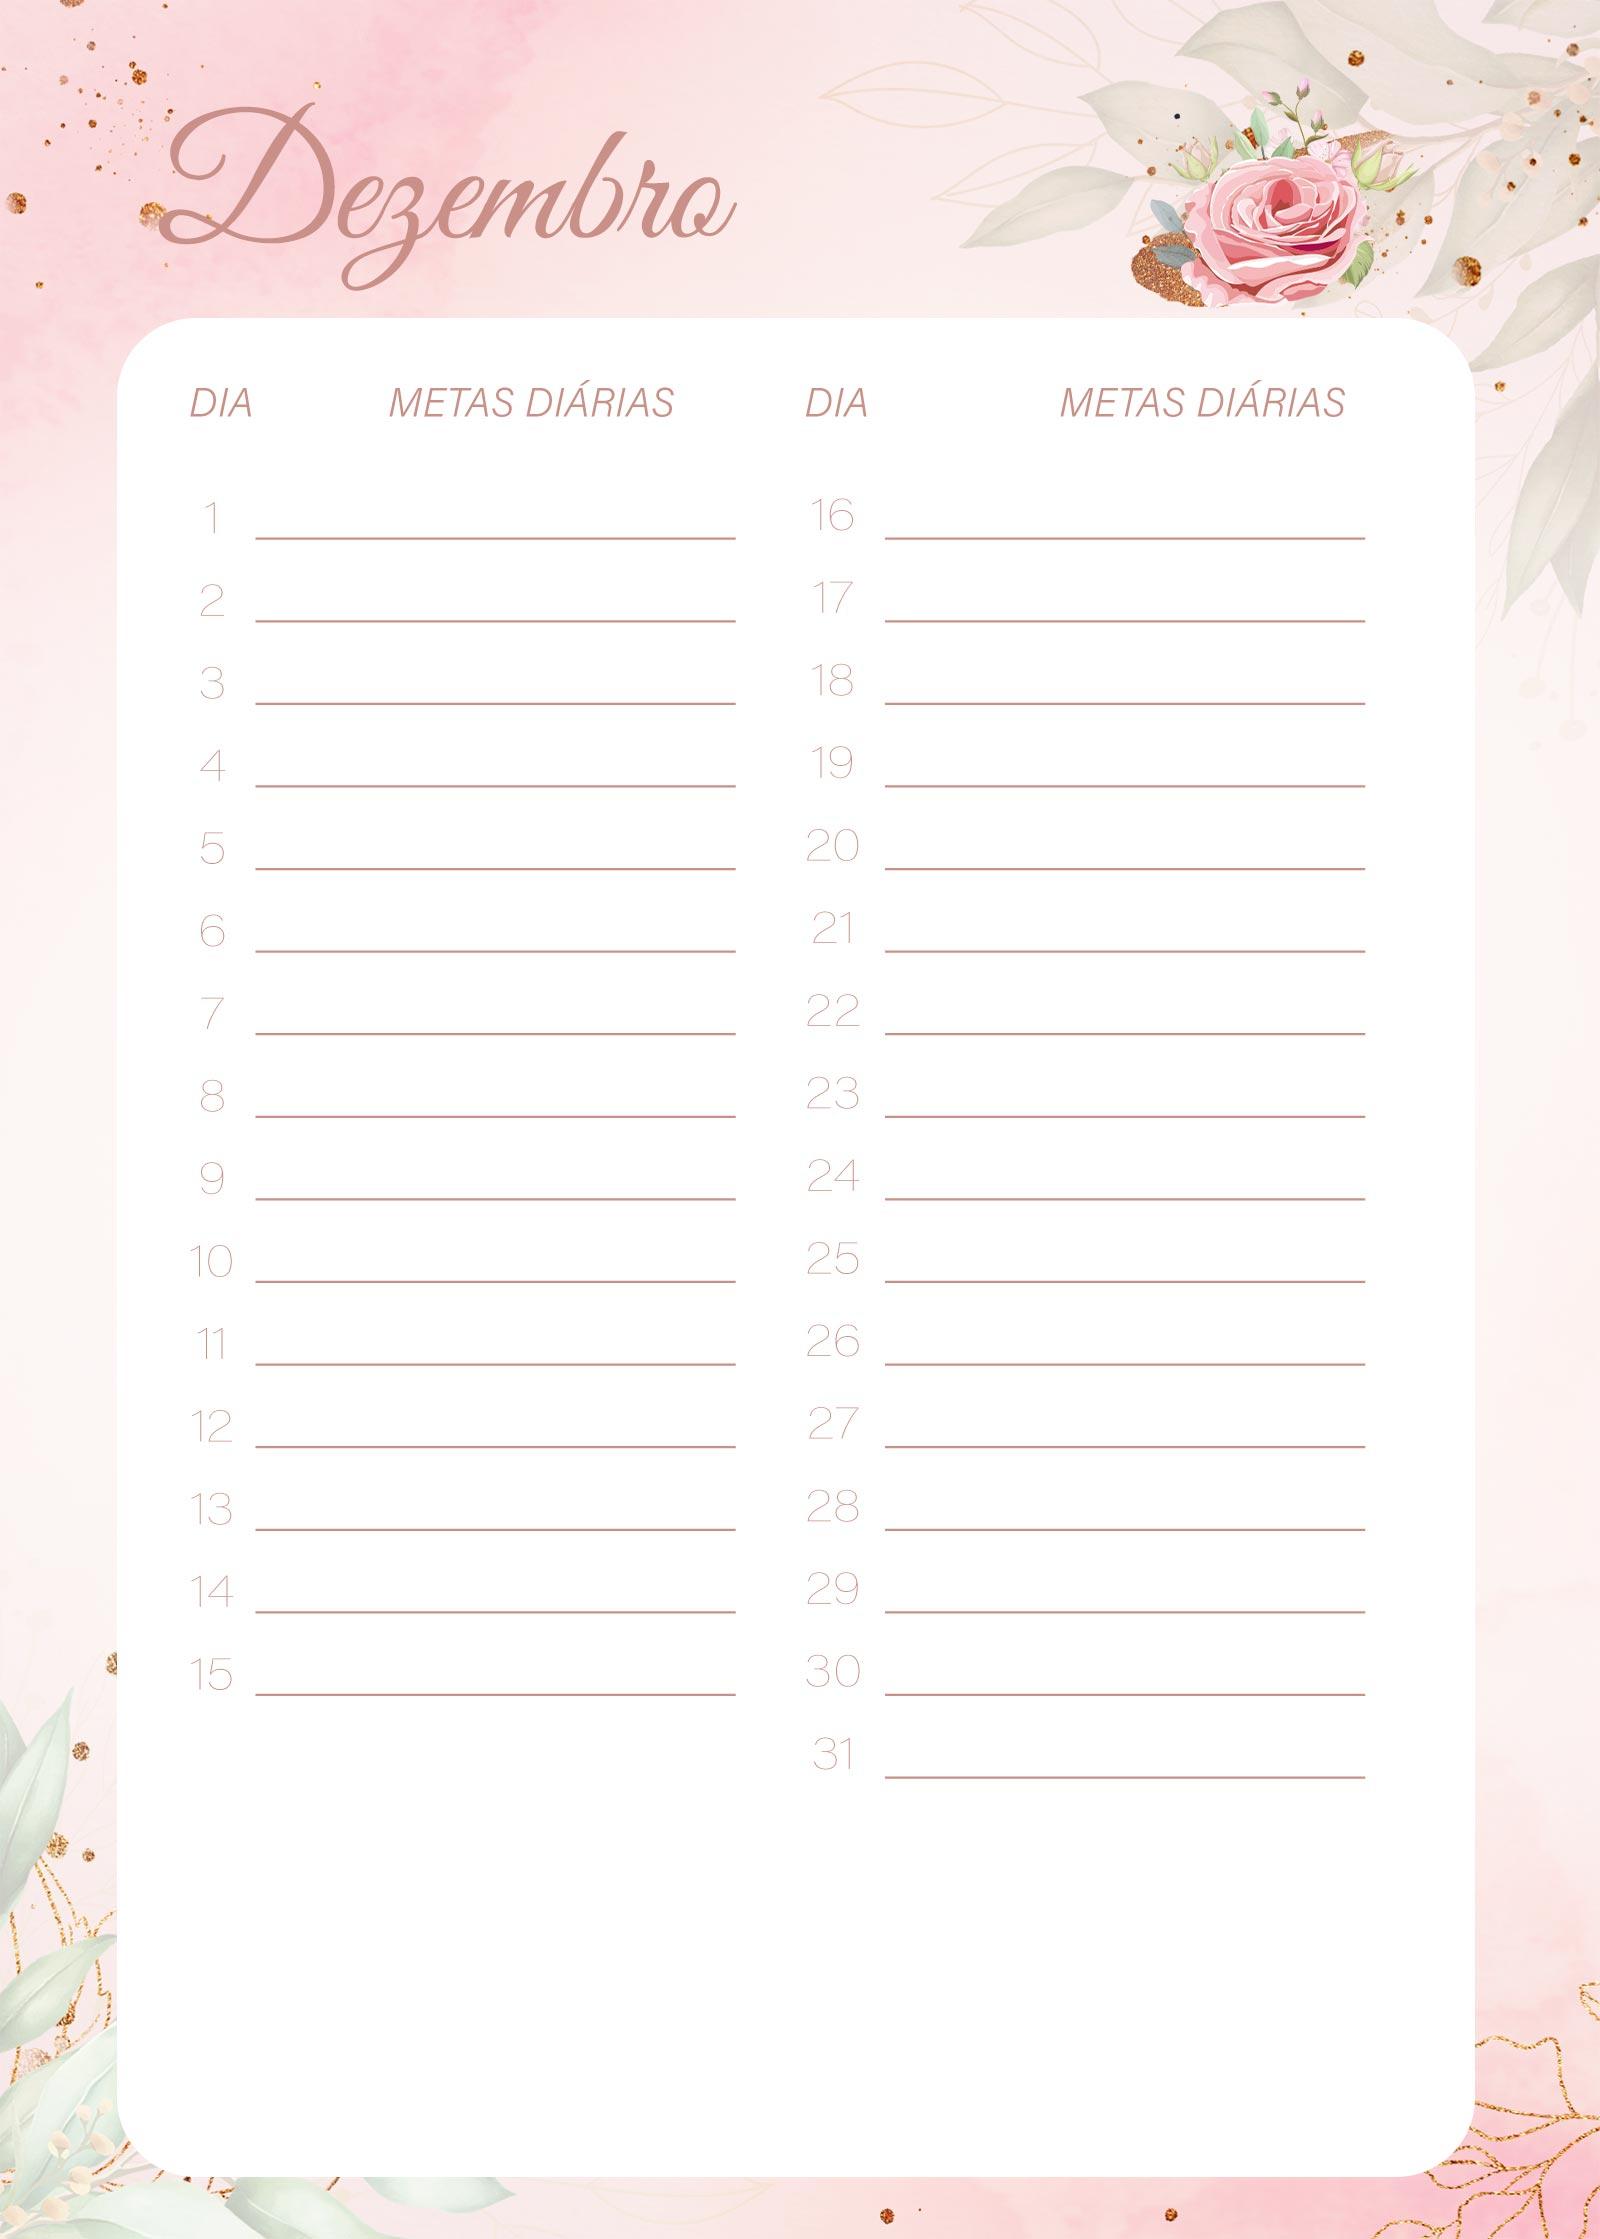 Planner 2021 Floral com Inicial Metas Diarias Dezembro